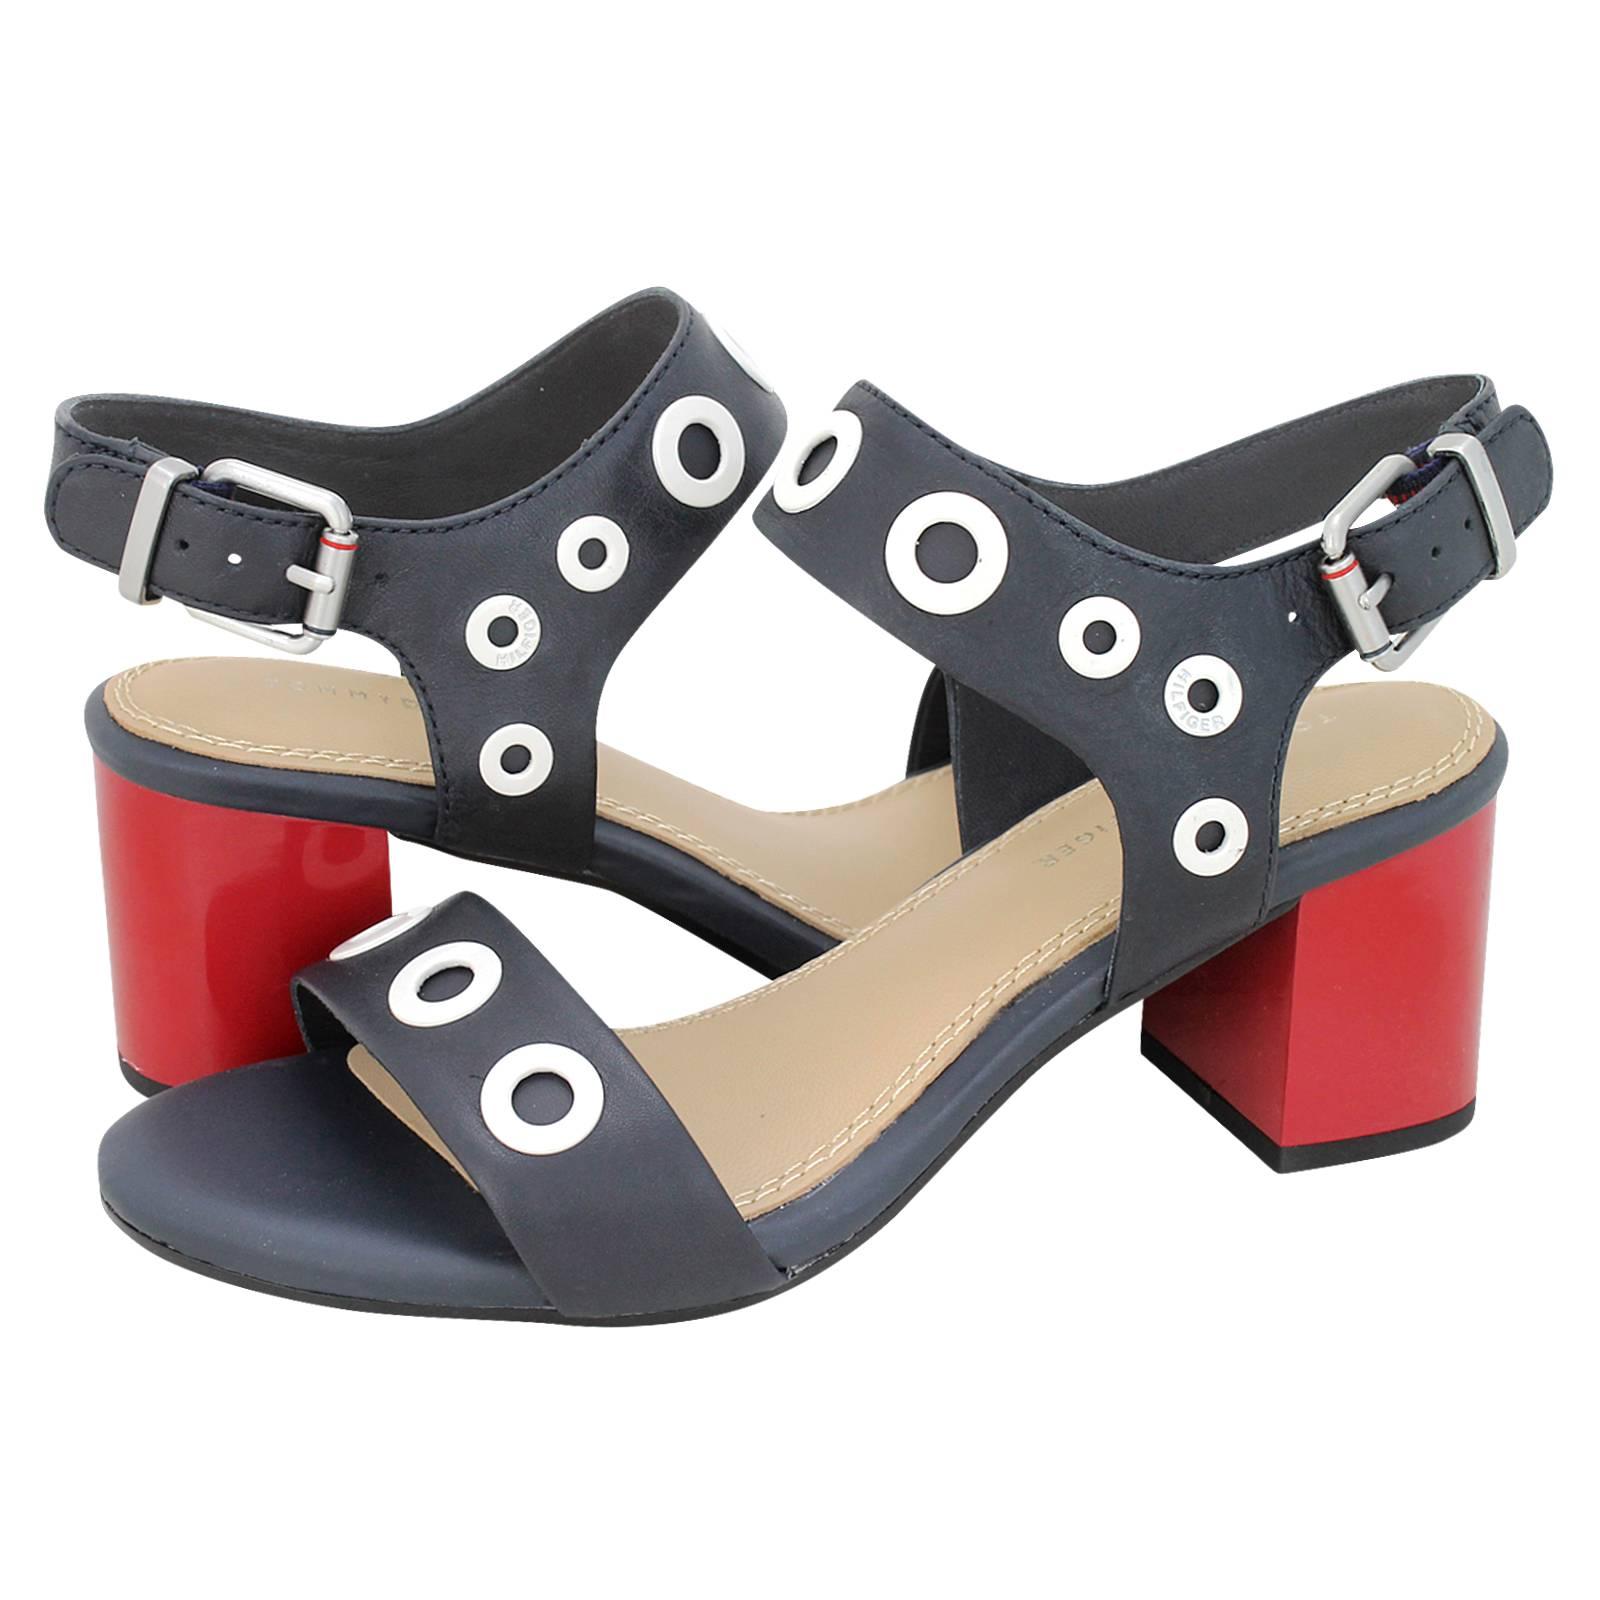 bfa9841a779f0 Tommy Hilfiger Blocky Mid Heel White Eyelets sandals. Blocky Mid Heel White  Eyelets